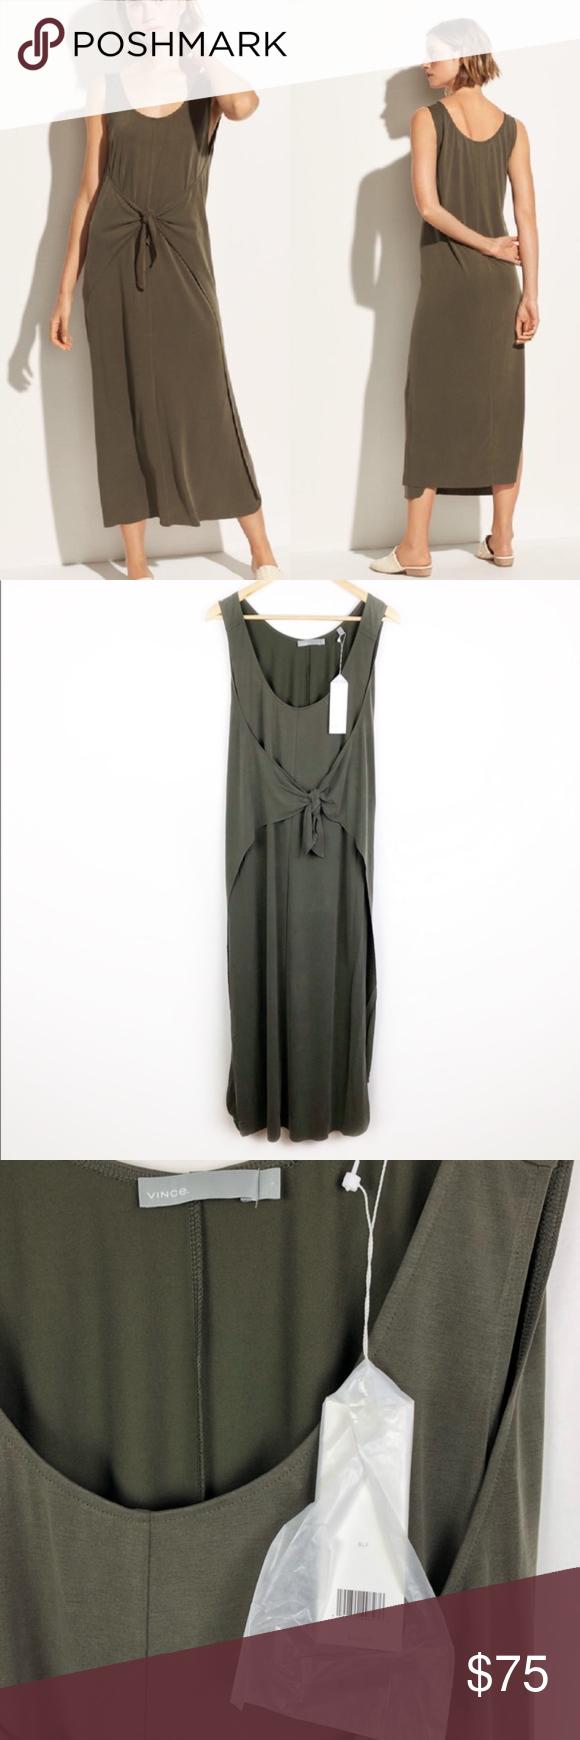 Nwt Vince Sleeveless Wrap Maxi Dress Bayleaf A64 Nwt Vince Sleeveless Wrap Maxi Dress In Bayleaf Super Soft And Stretchy B Maxi Wrap Dress Maxi Dress Dresses [ 1740 x 580 Pixel ]